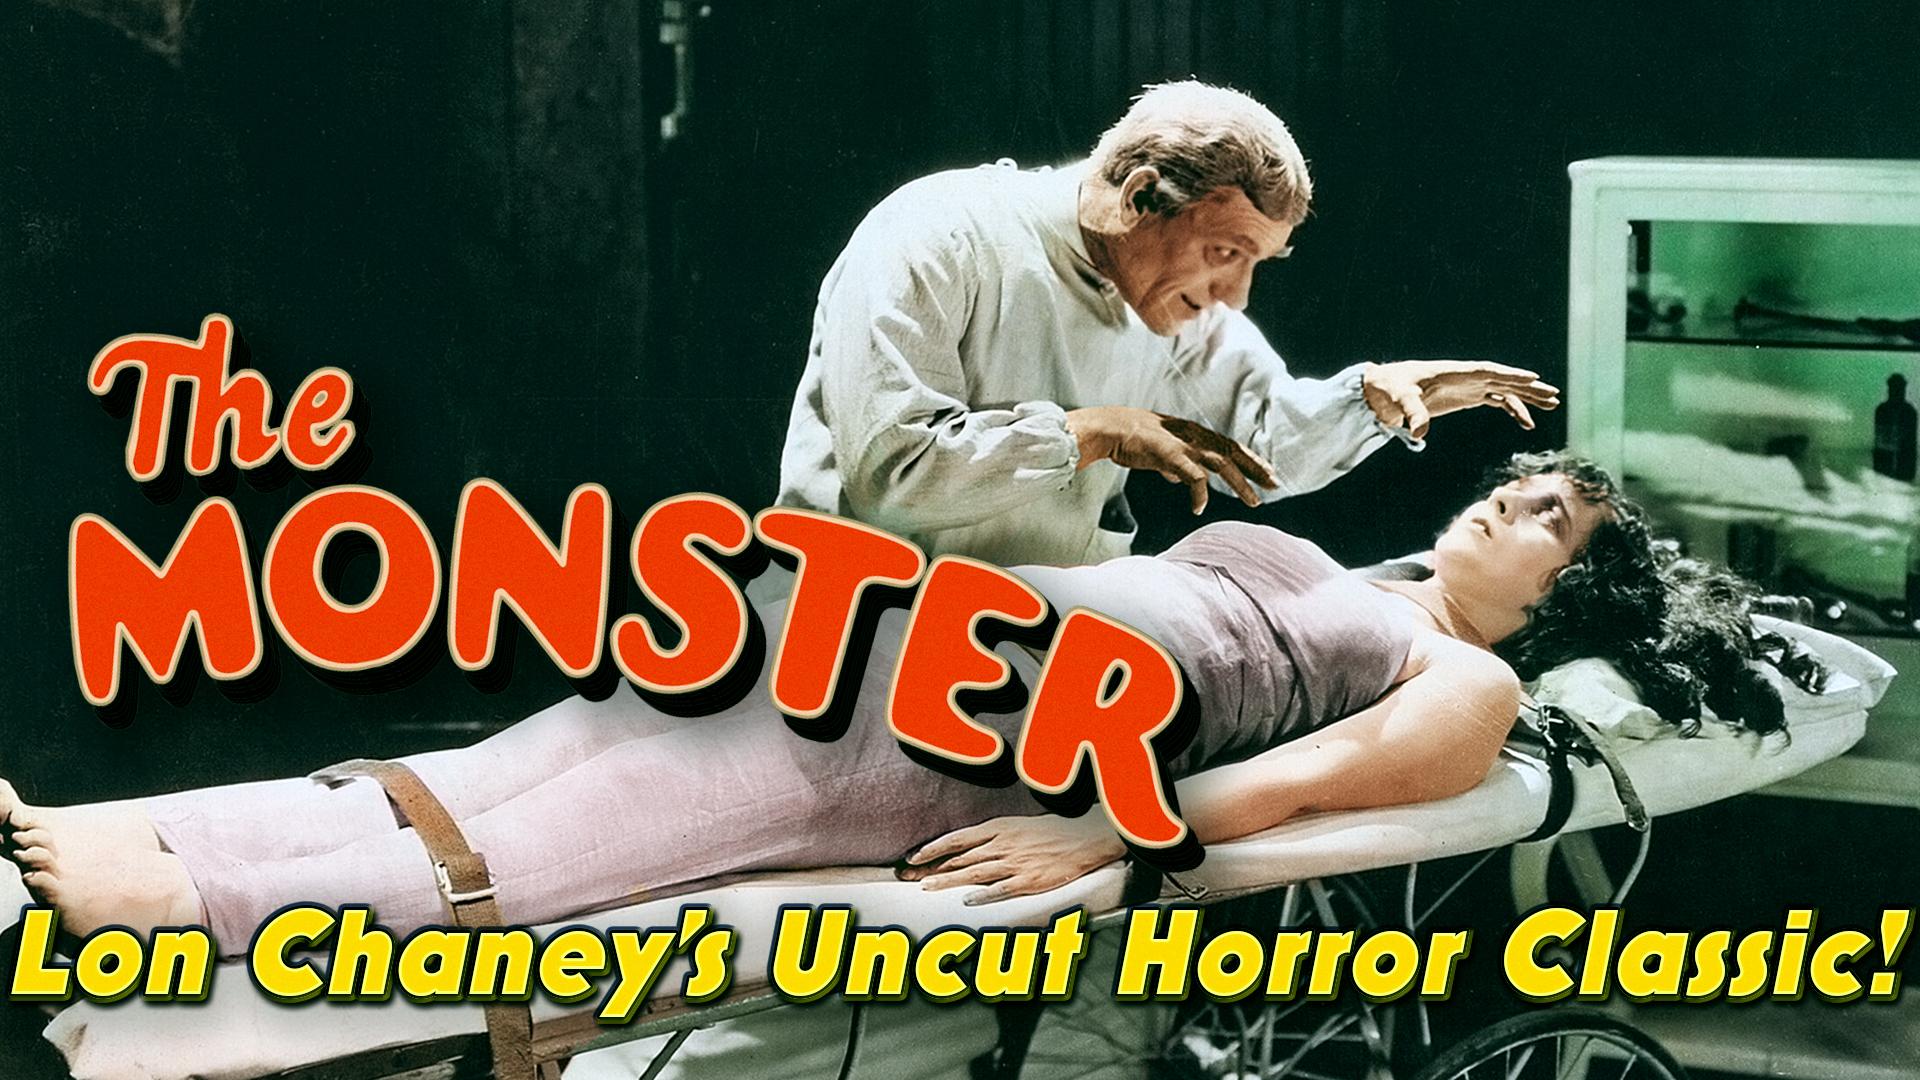 The Monster - Lon Chaney's Uncut Horror Classic!